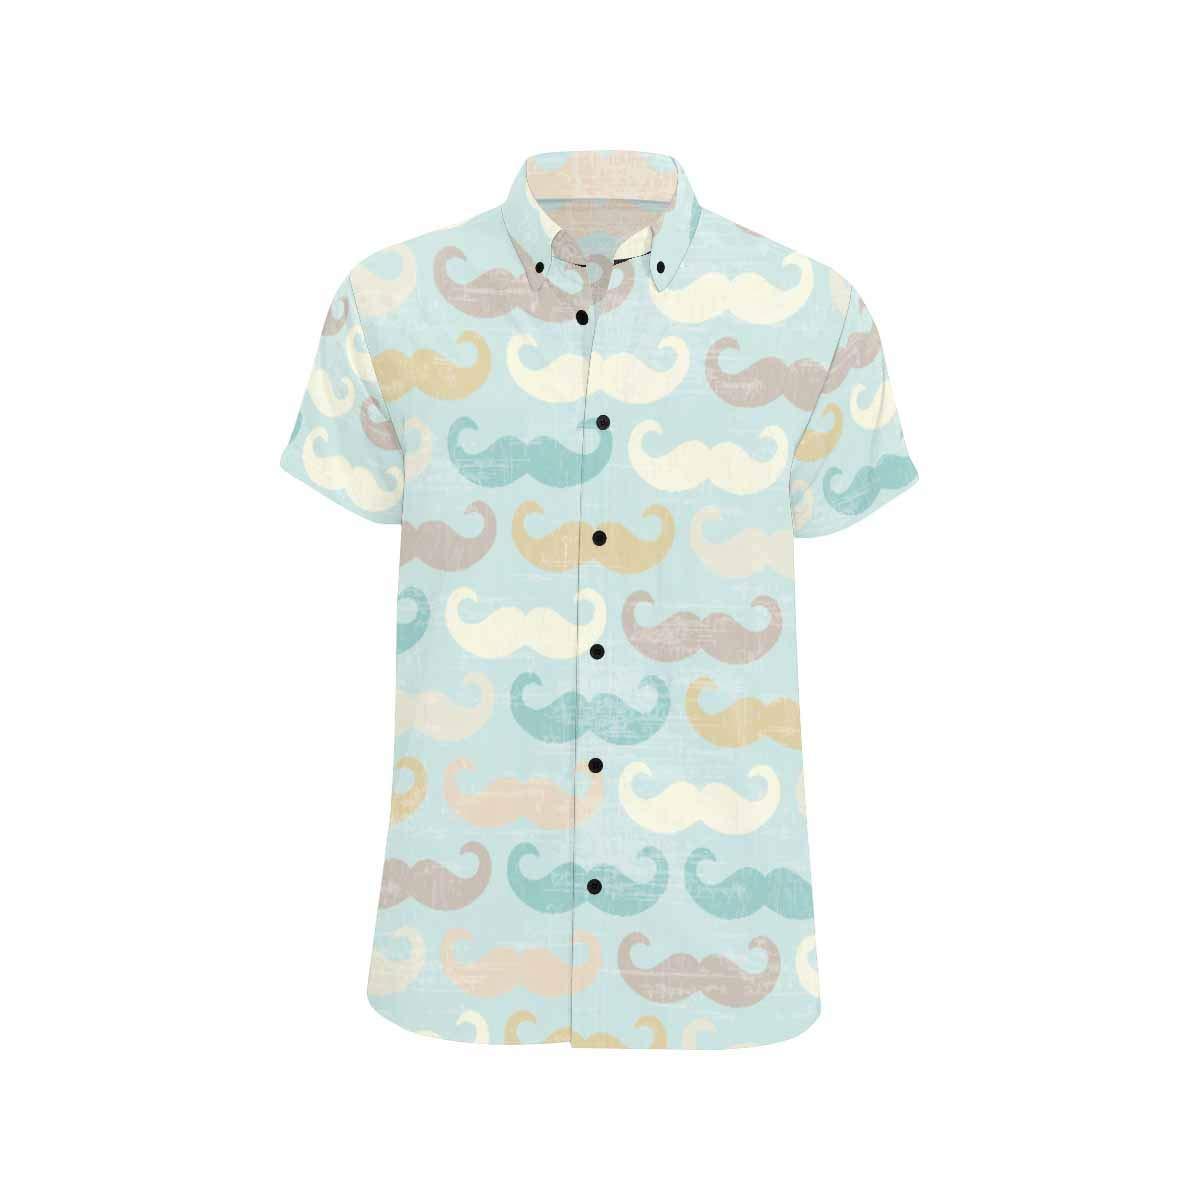 InterestPrint Casual Retro Mustache Casual Button Down Beach Shirts